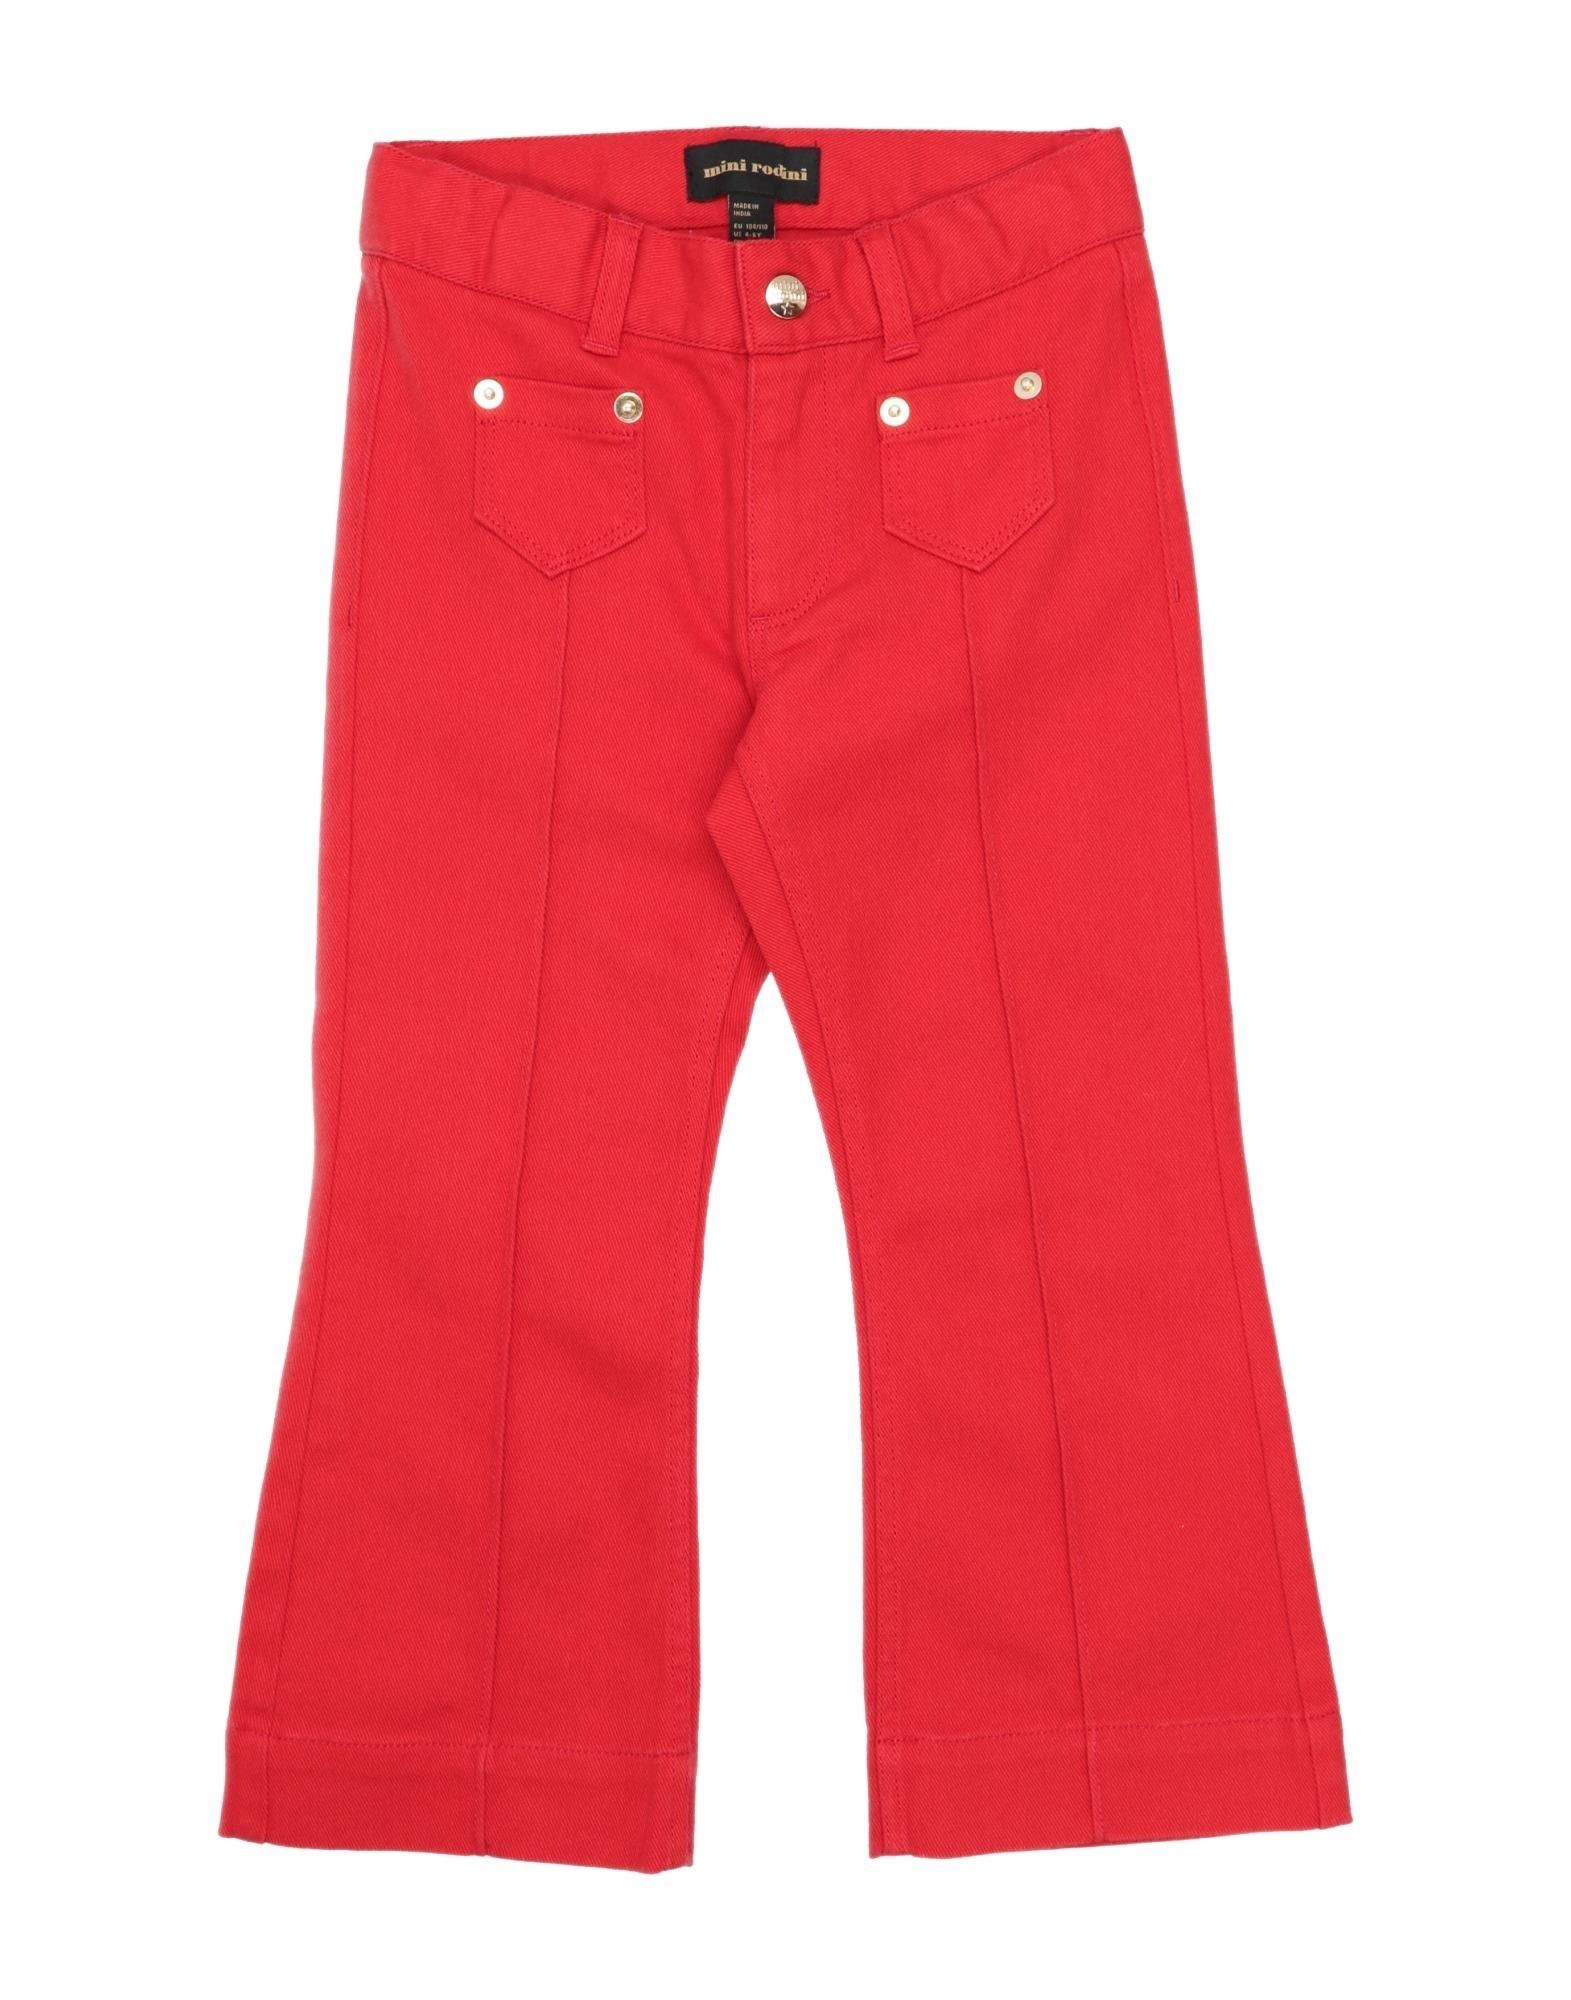 MINI RODINI Джинсовые брюки